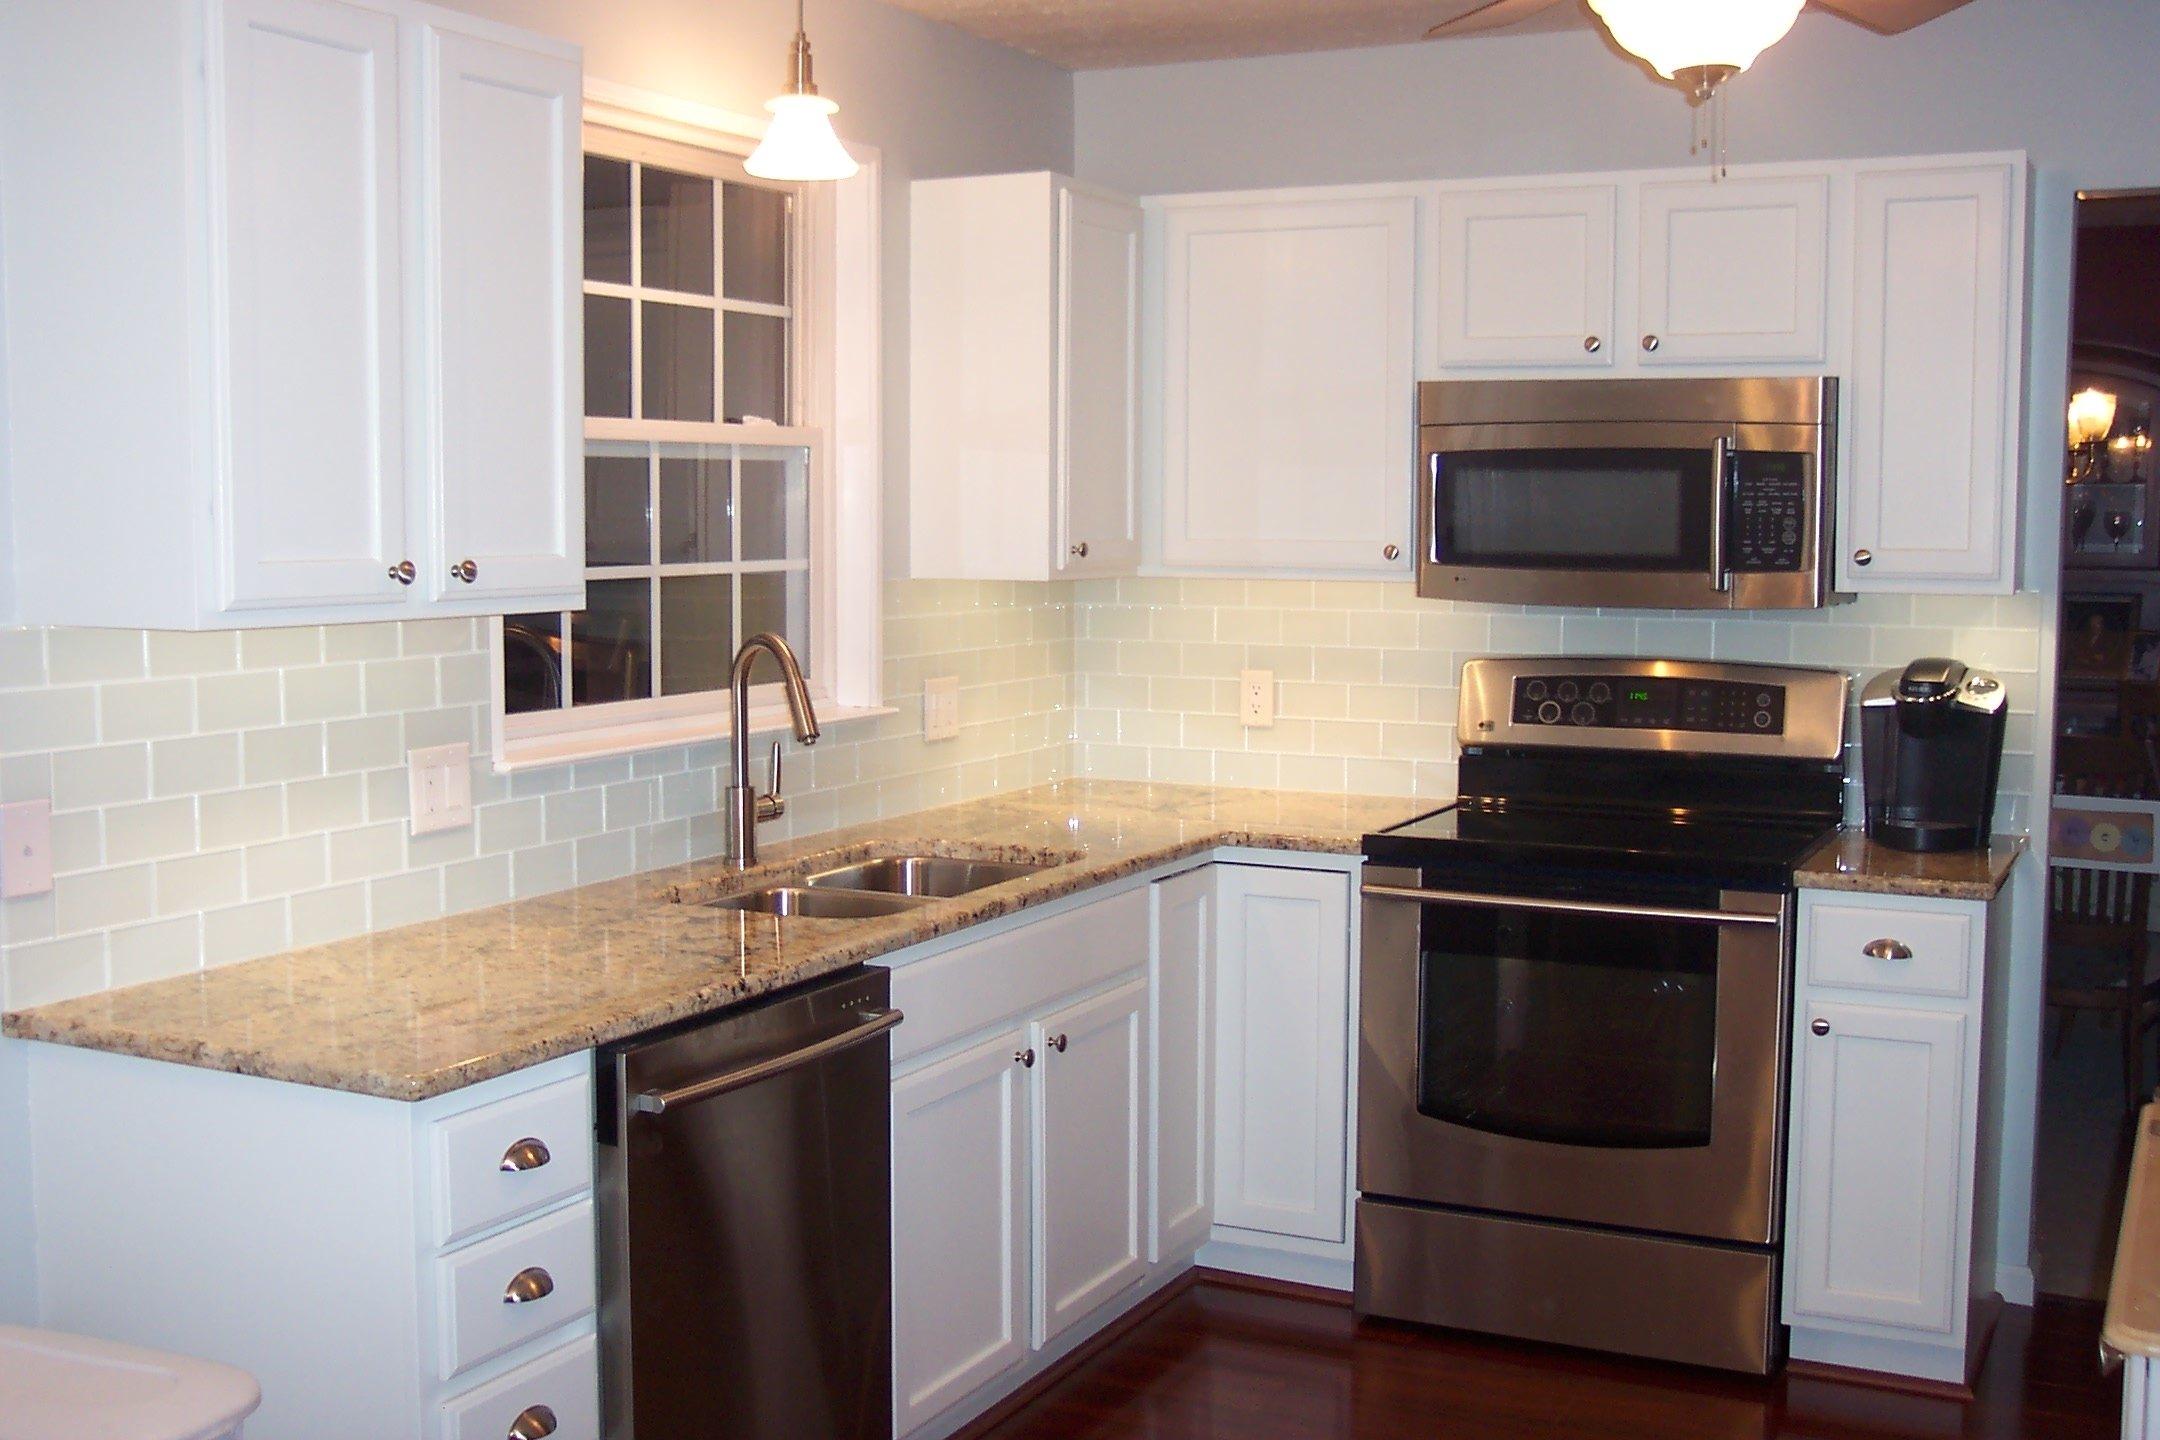 10 Gorgeous Subway Tile Kitchen Backsplash Ideas white kitchen with subway tile backsplash ideas image amys office 2020